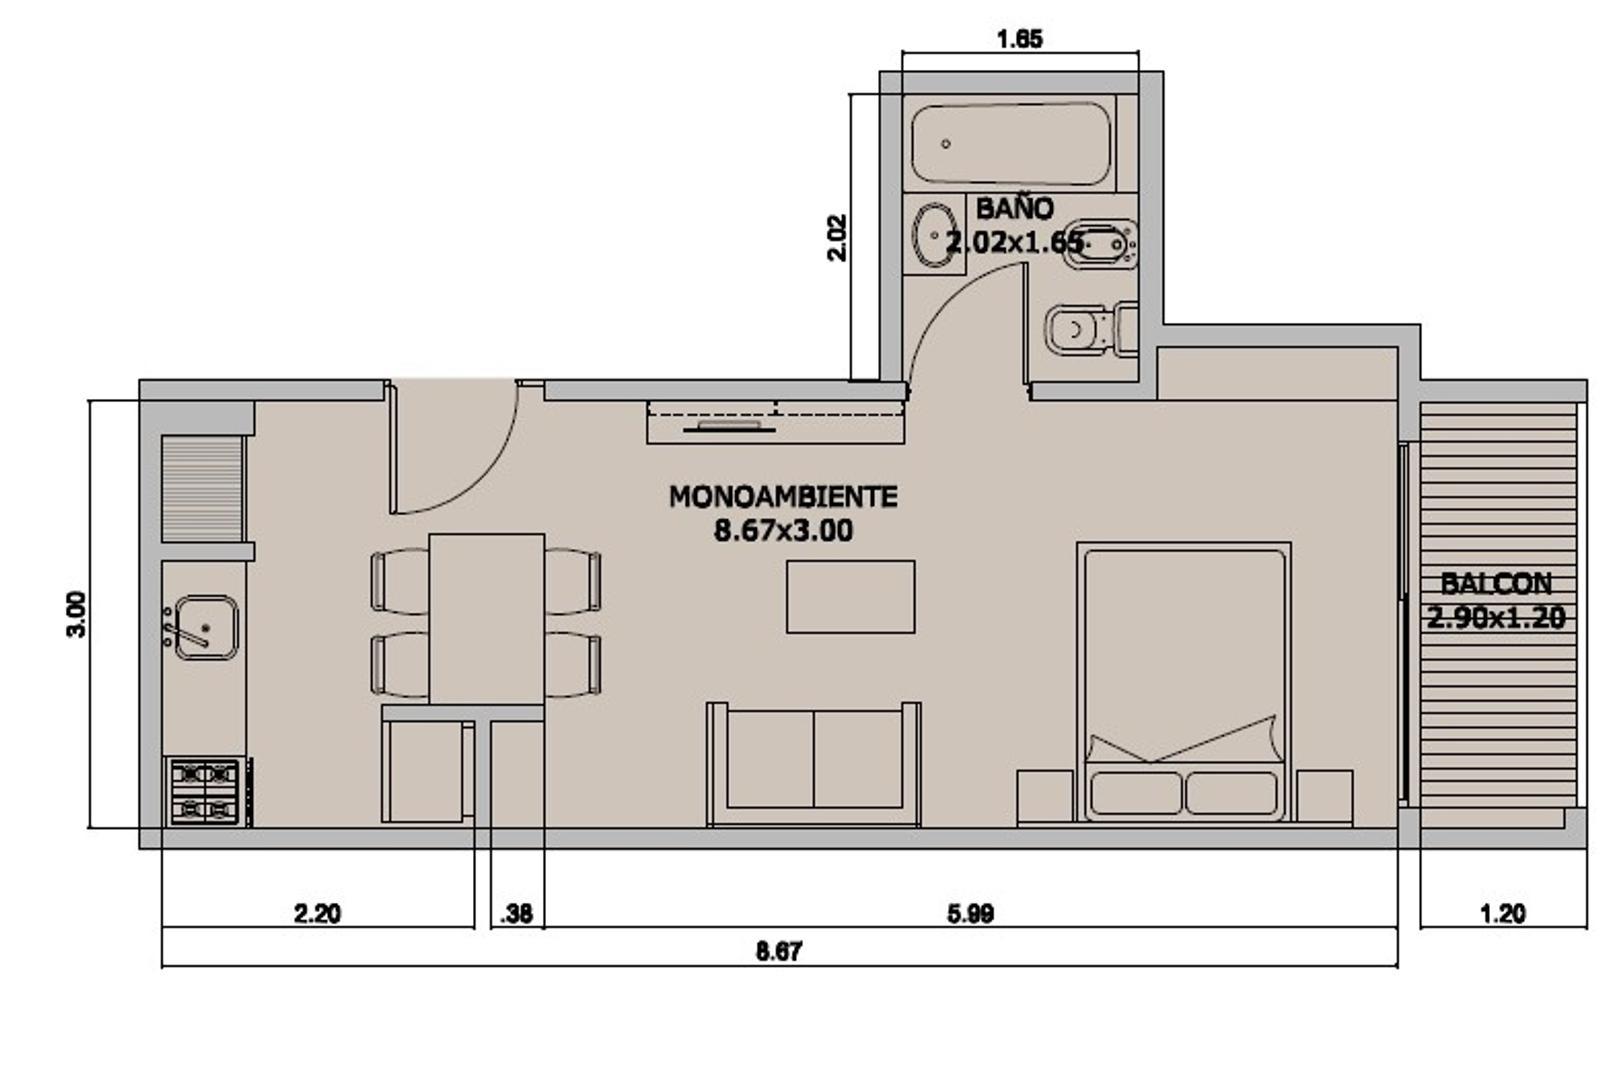 Villa Crespo venta Estrenar en obra LOFT 48m2 divisible en 2 amb apto profesional contrafr amenities